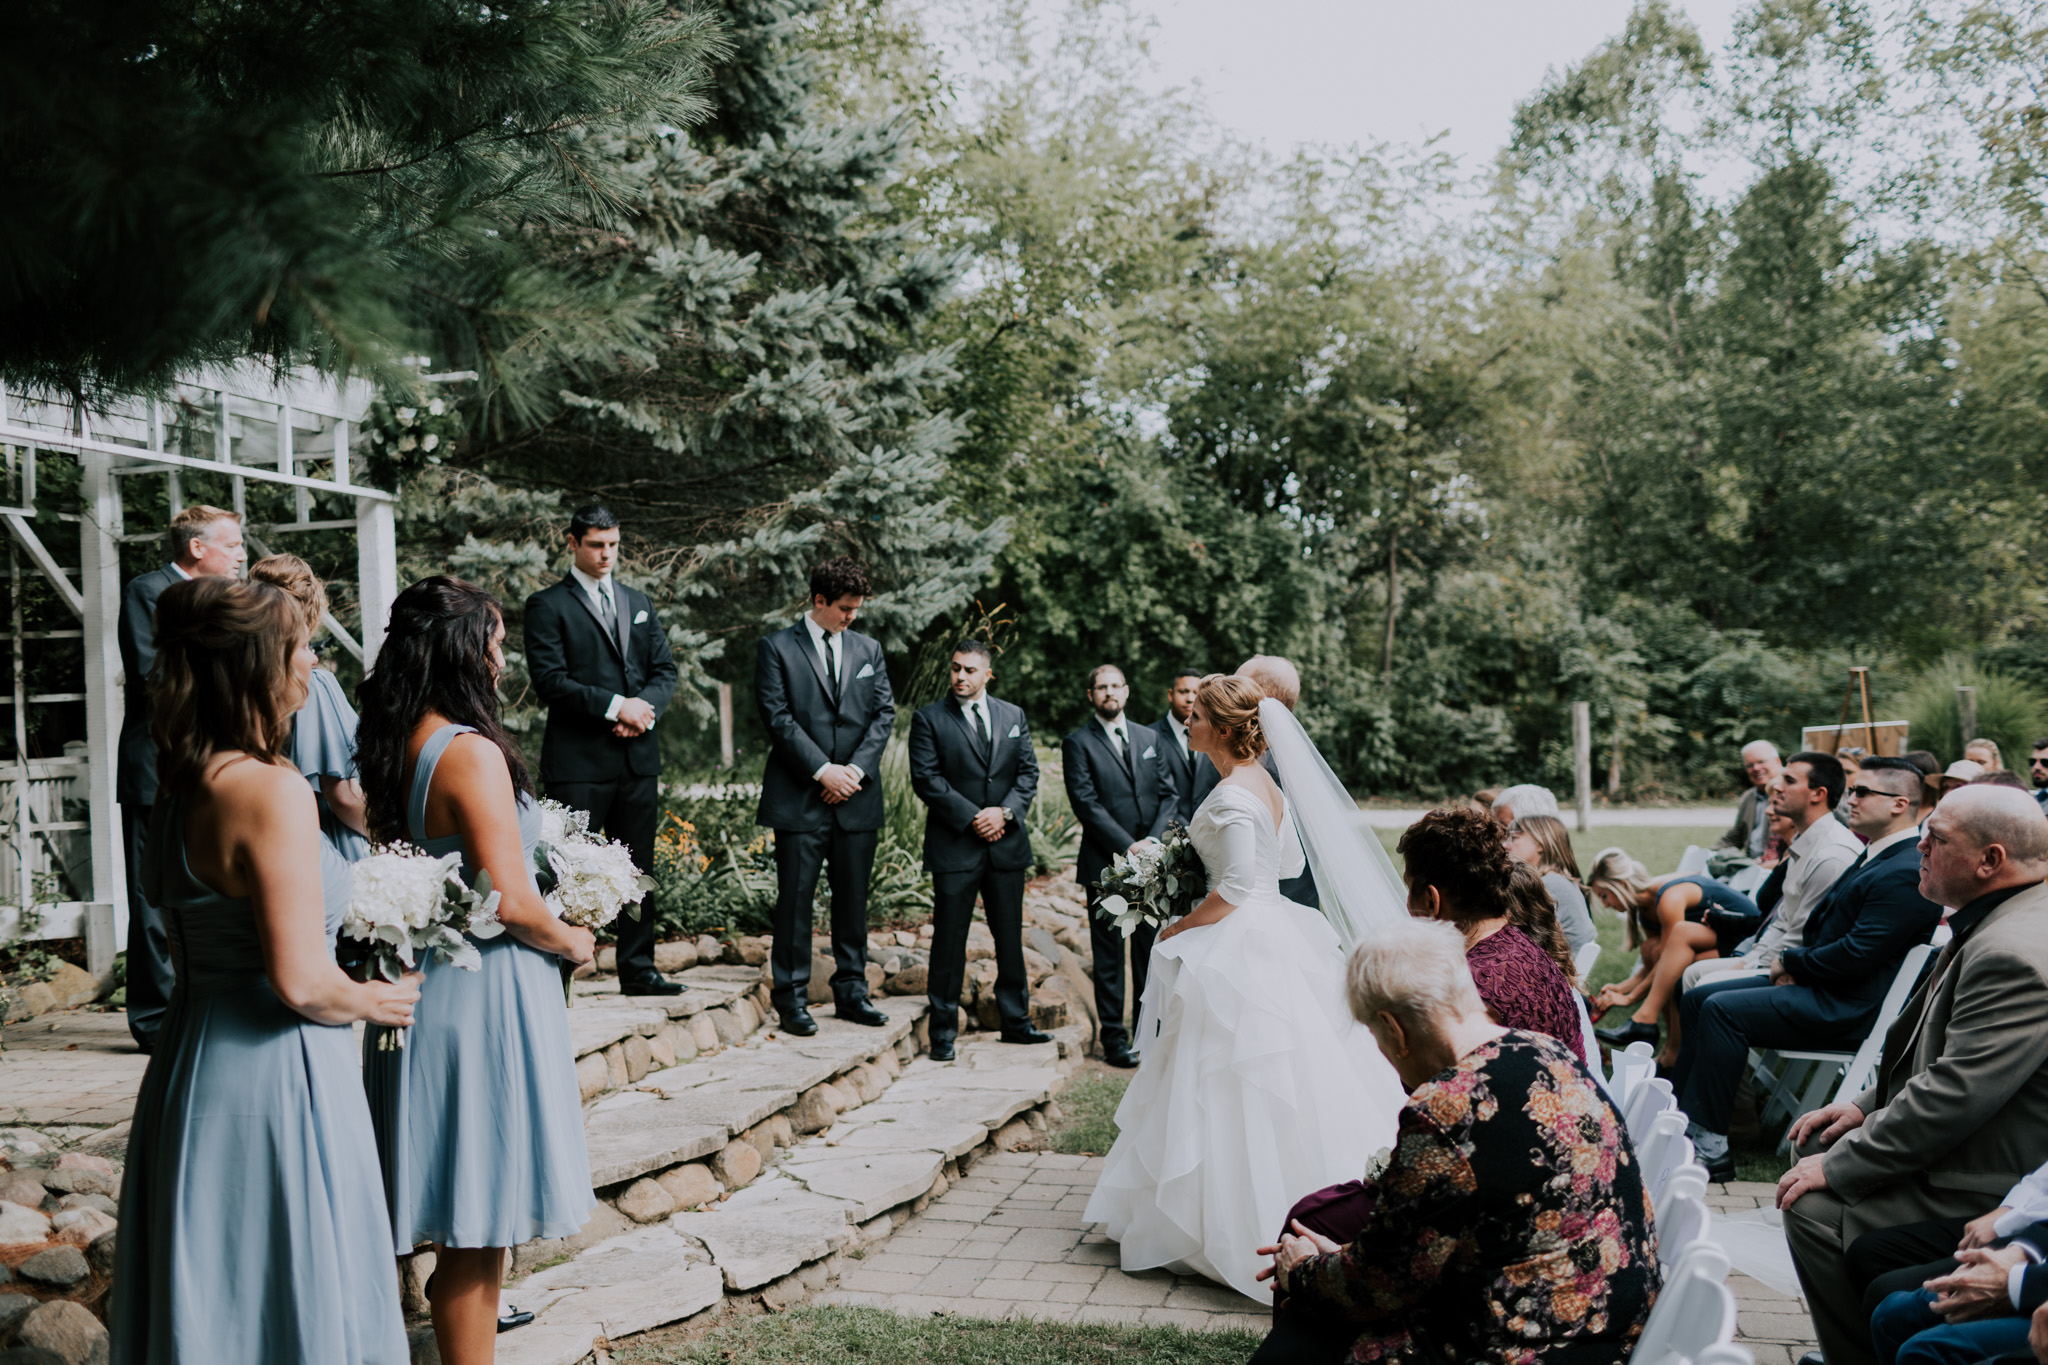 MillCreek-Wilde-Wedding-Barn-Michigan-Eliza-Eric-Vafa-Photo626.jpg